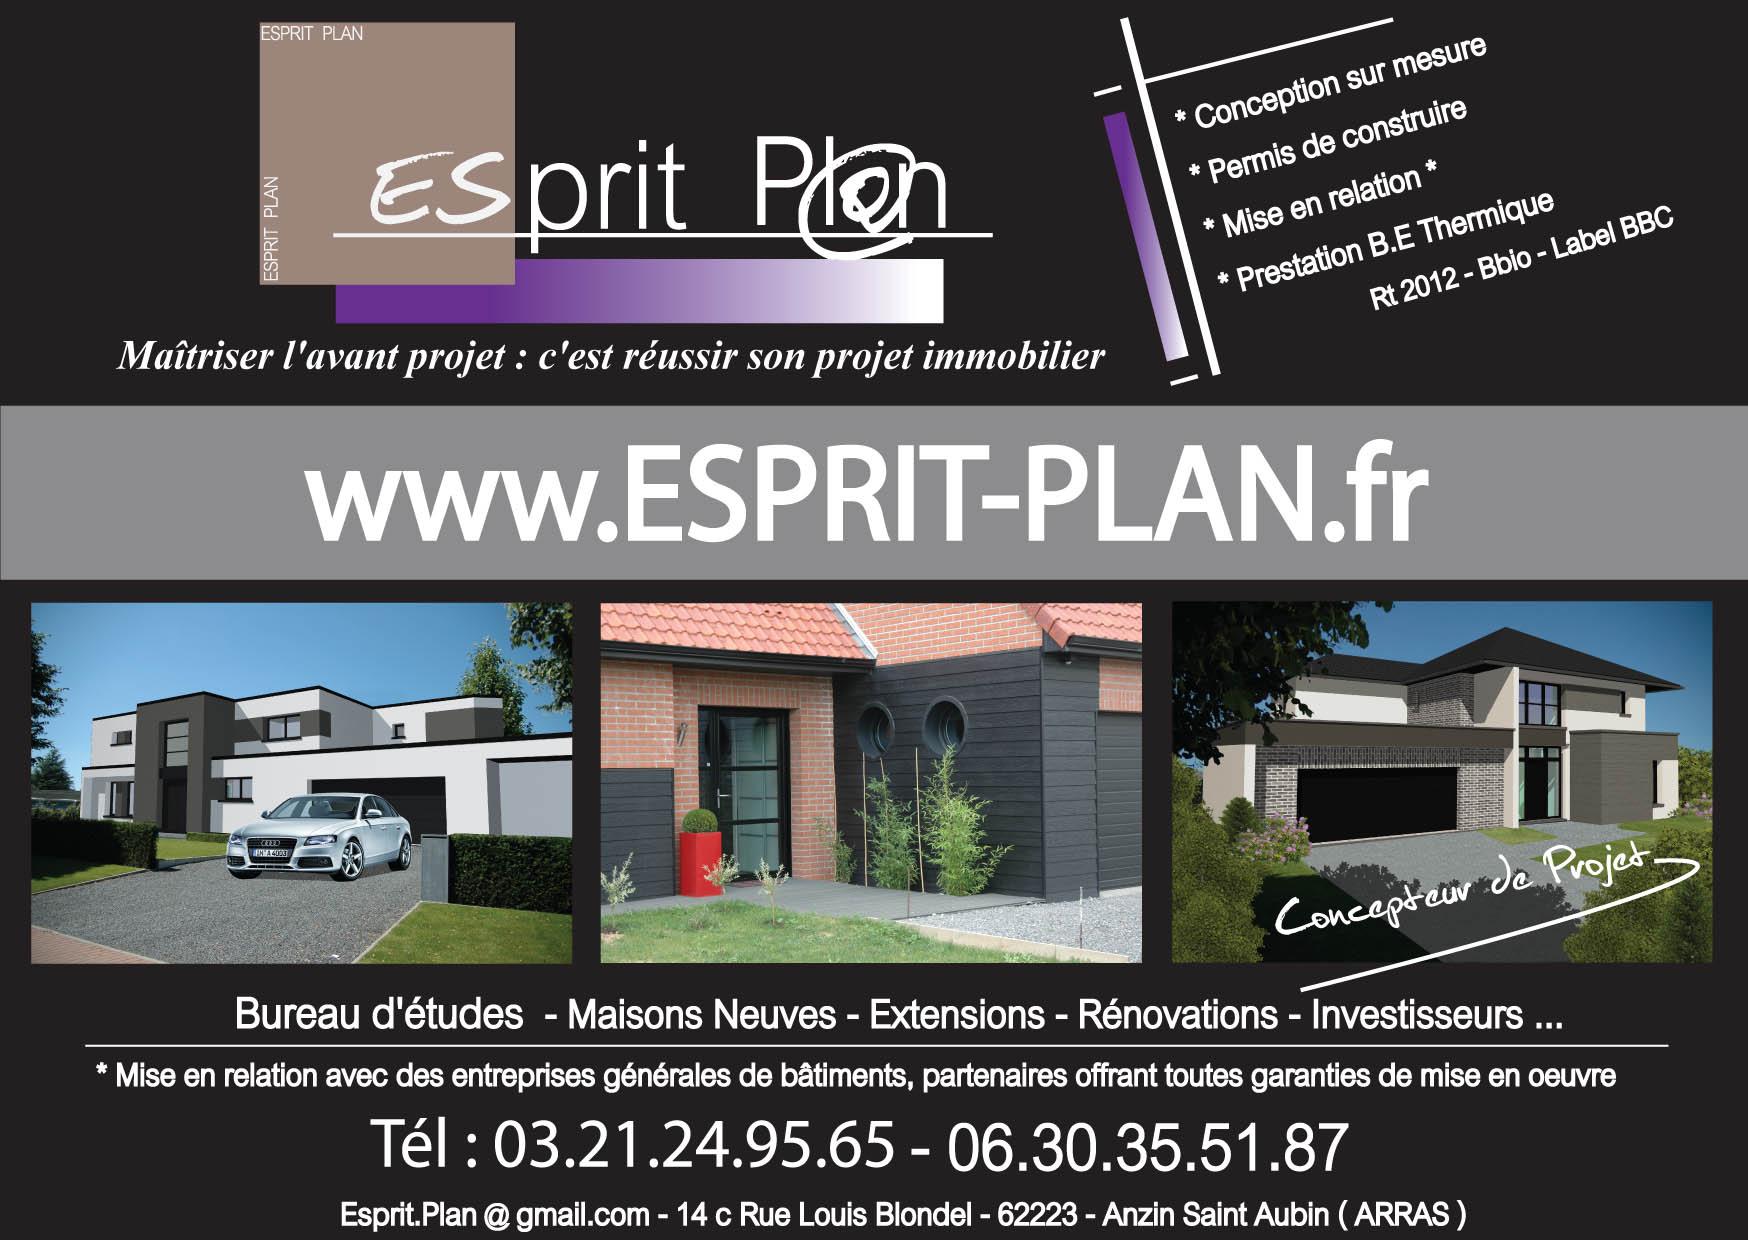 ESPRIT PLAN PERMIS DE CONSTRUIRE EXTENSIONS RENOVATIONS